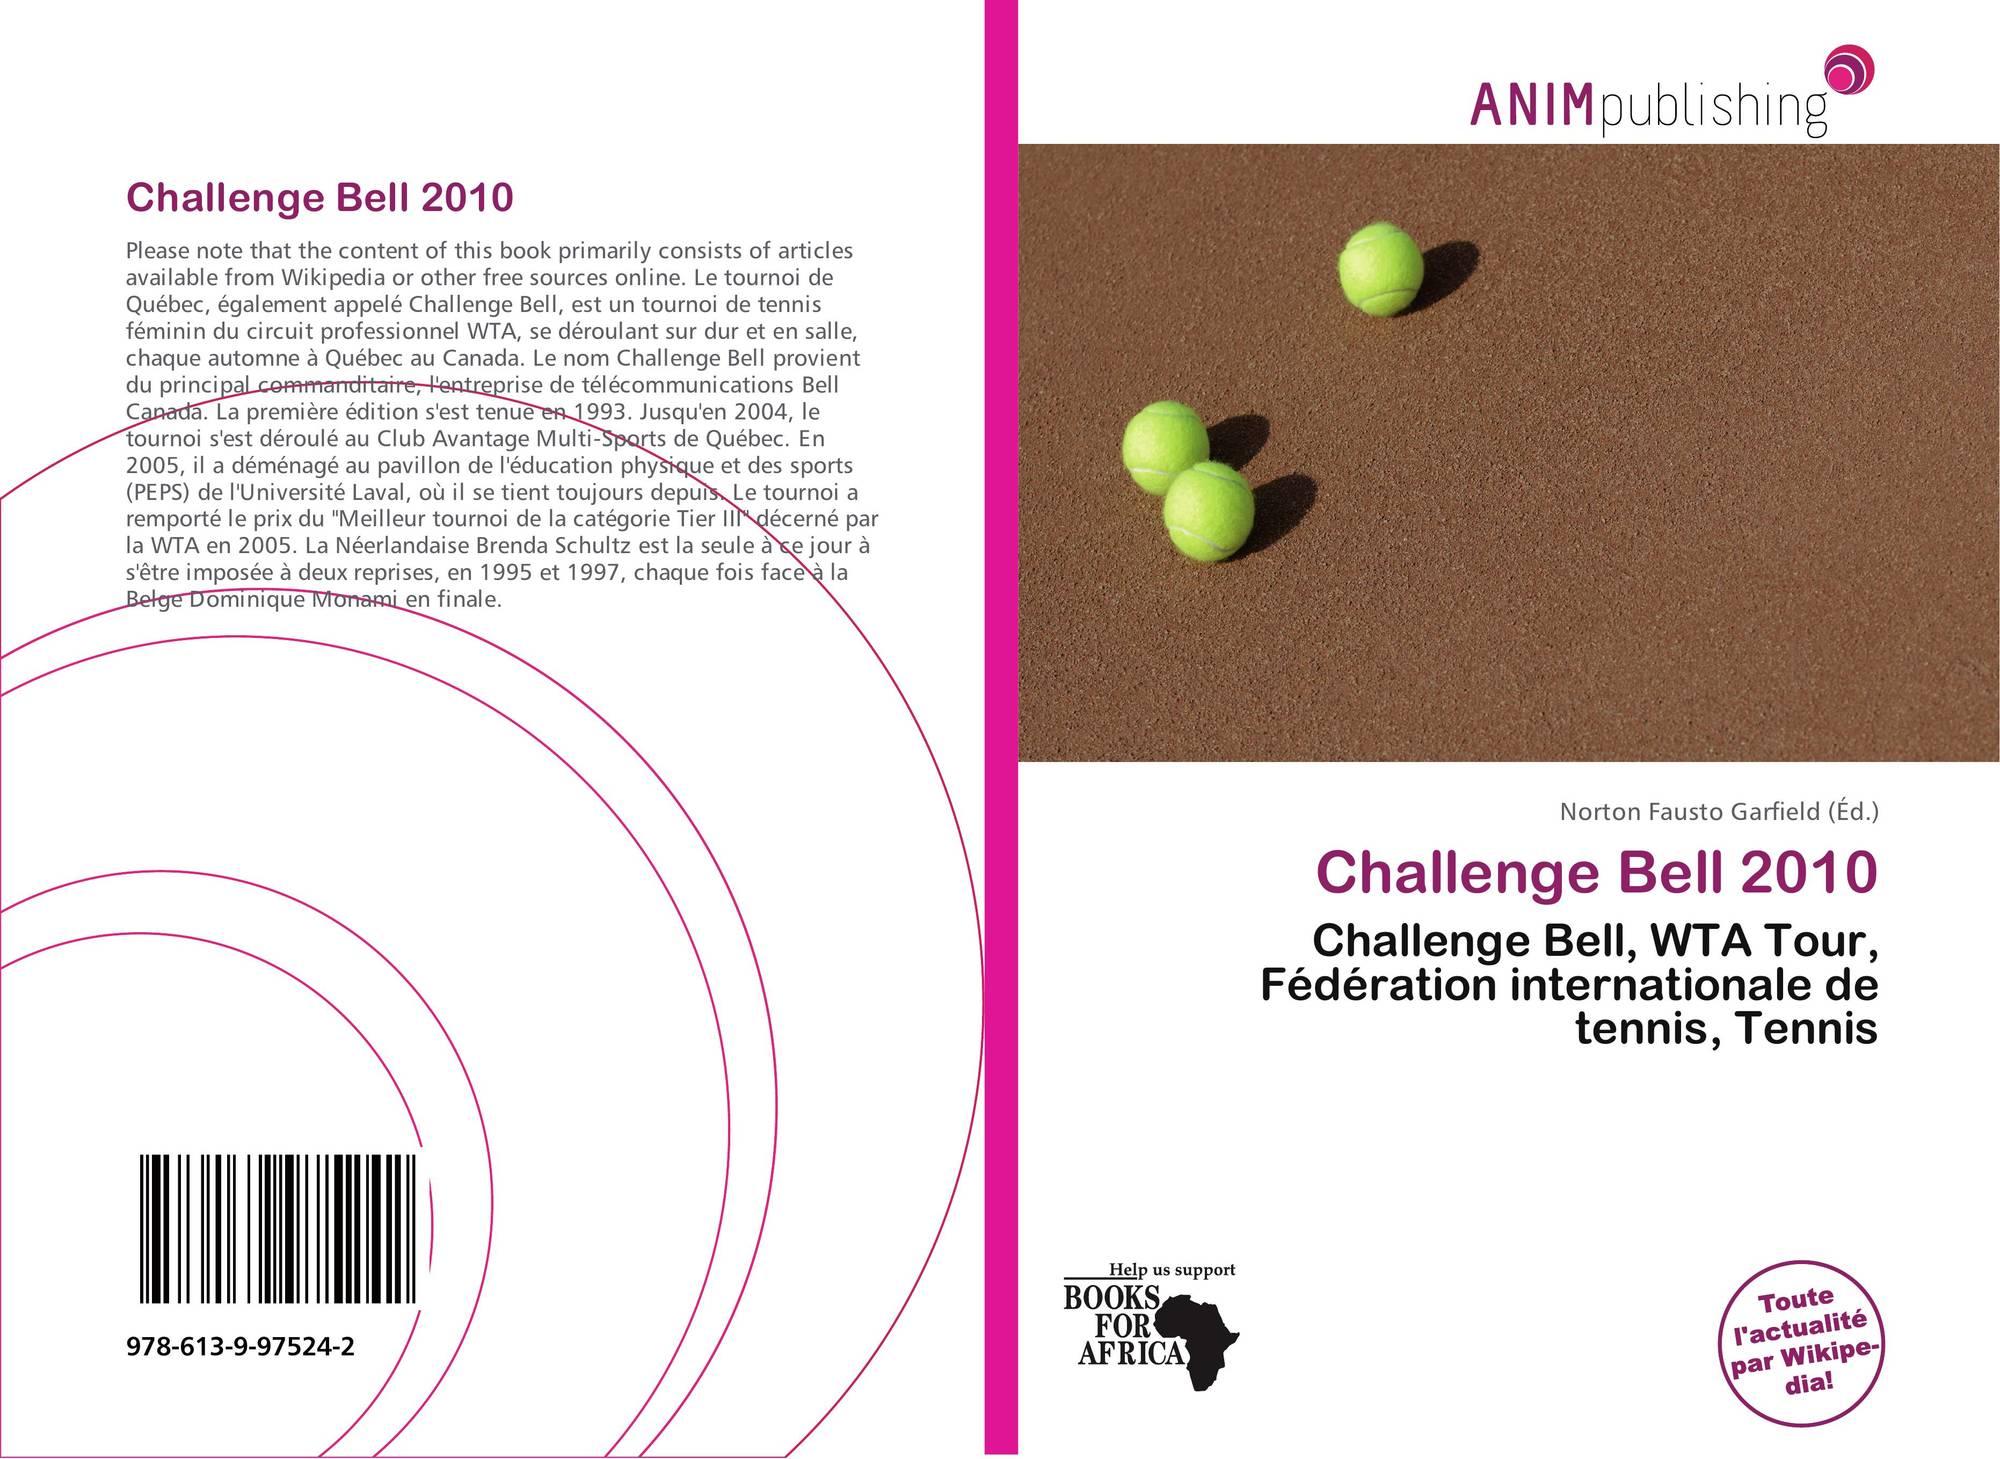 2010 Challenge Bell #